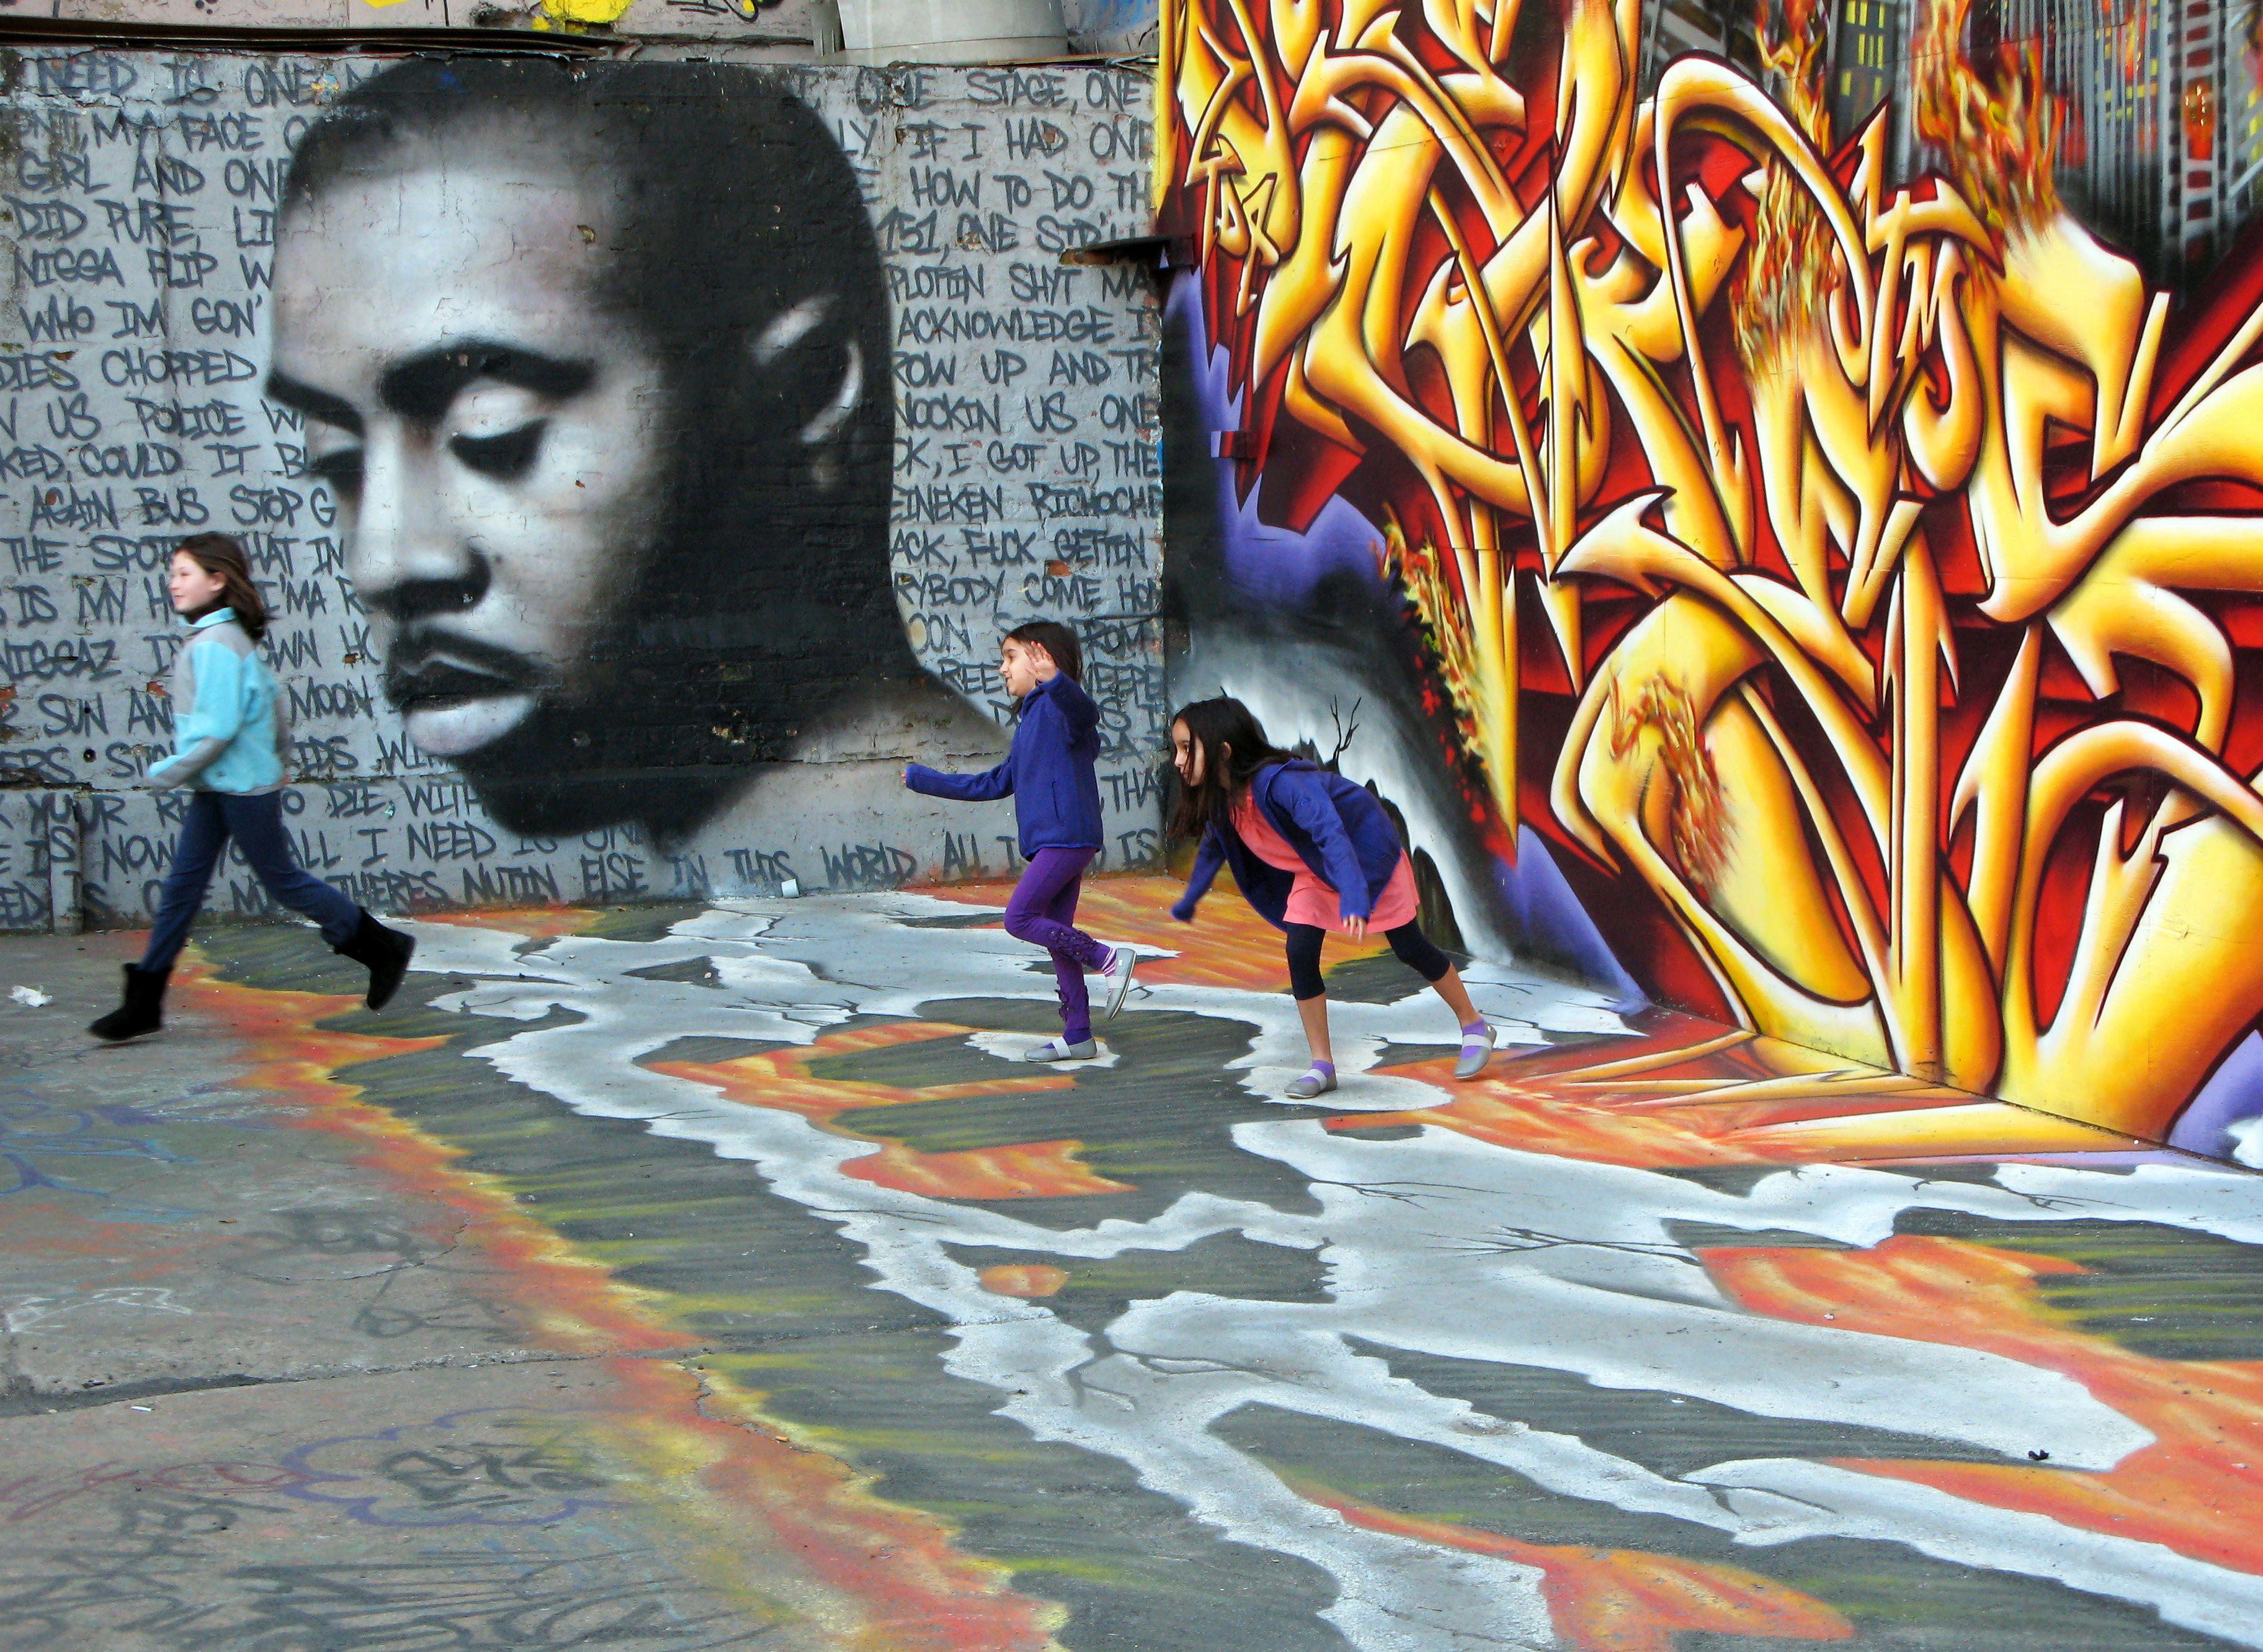 Nas mural w lyrics to one mic